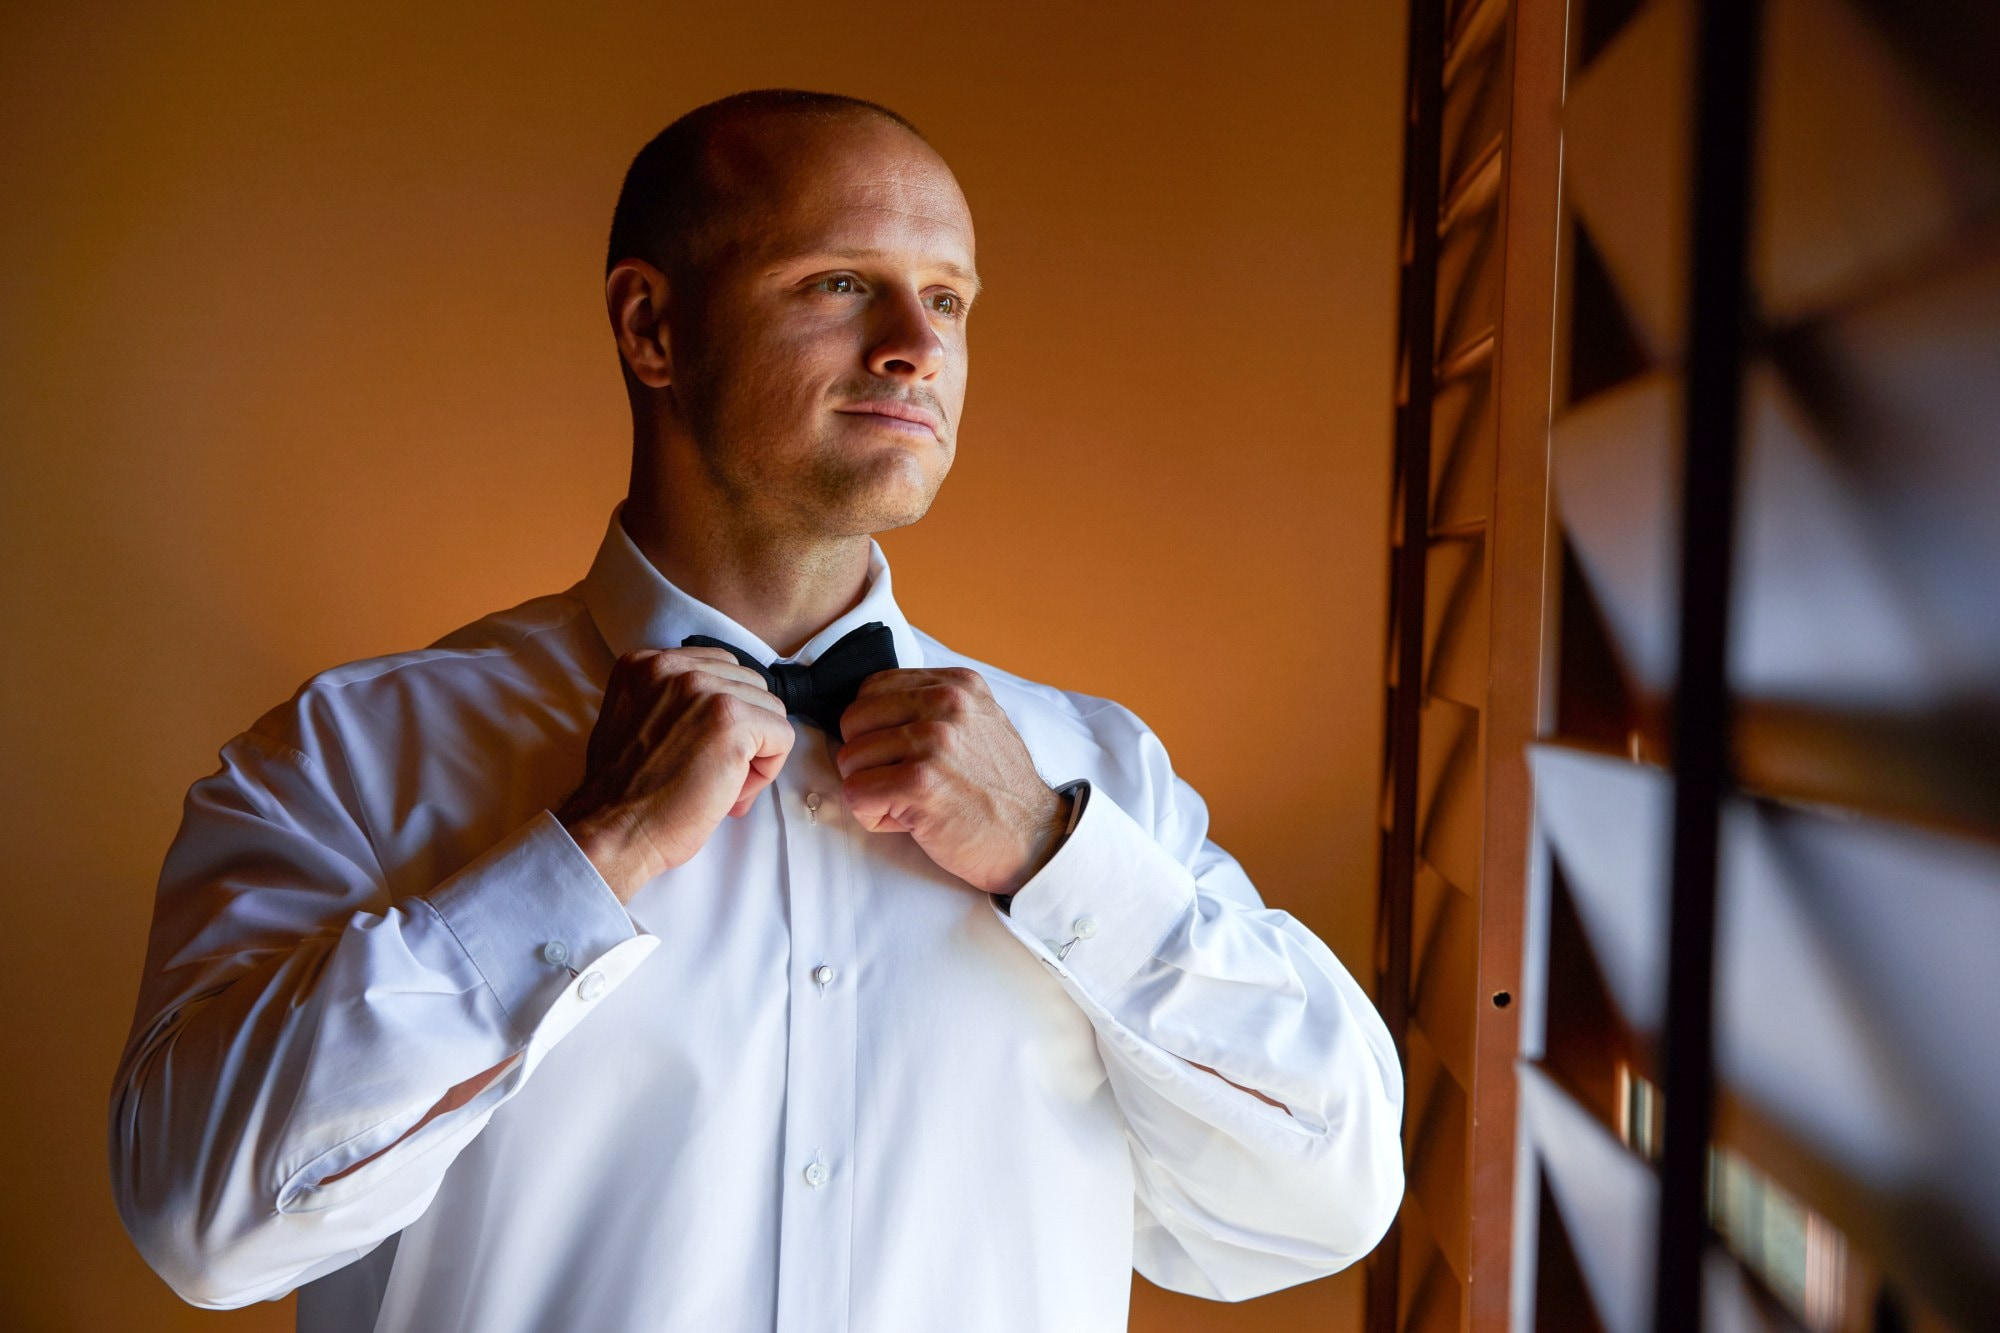 a man wearing a neck tie